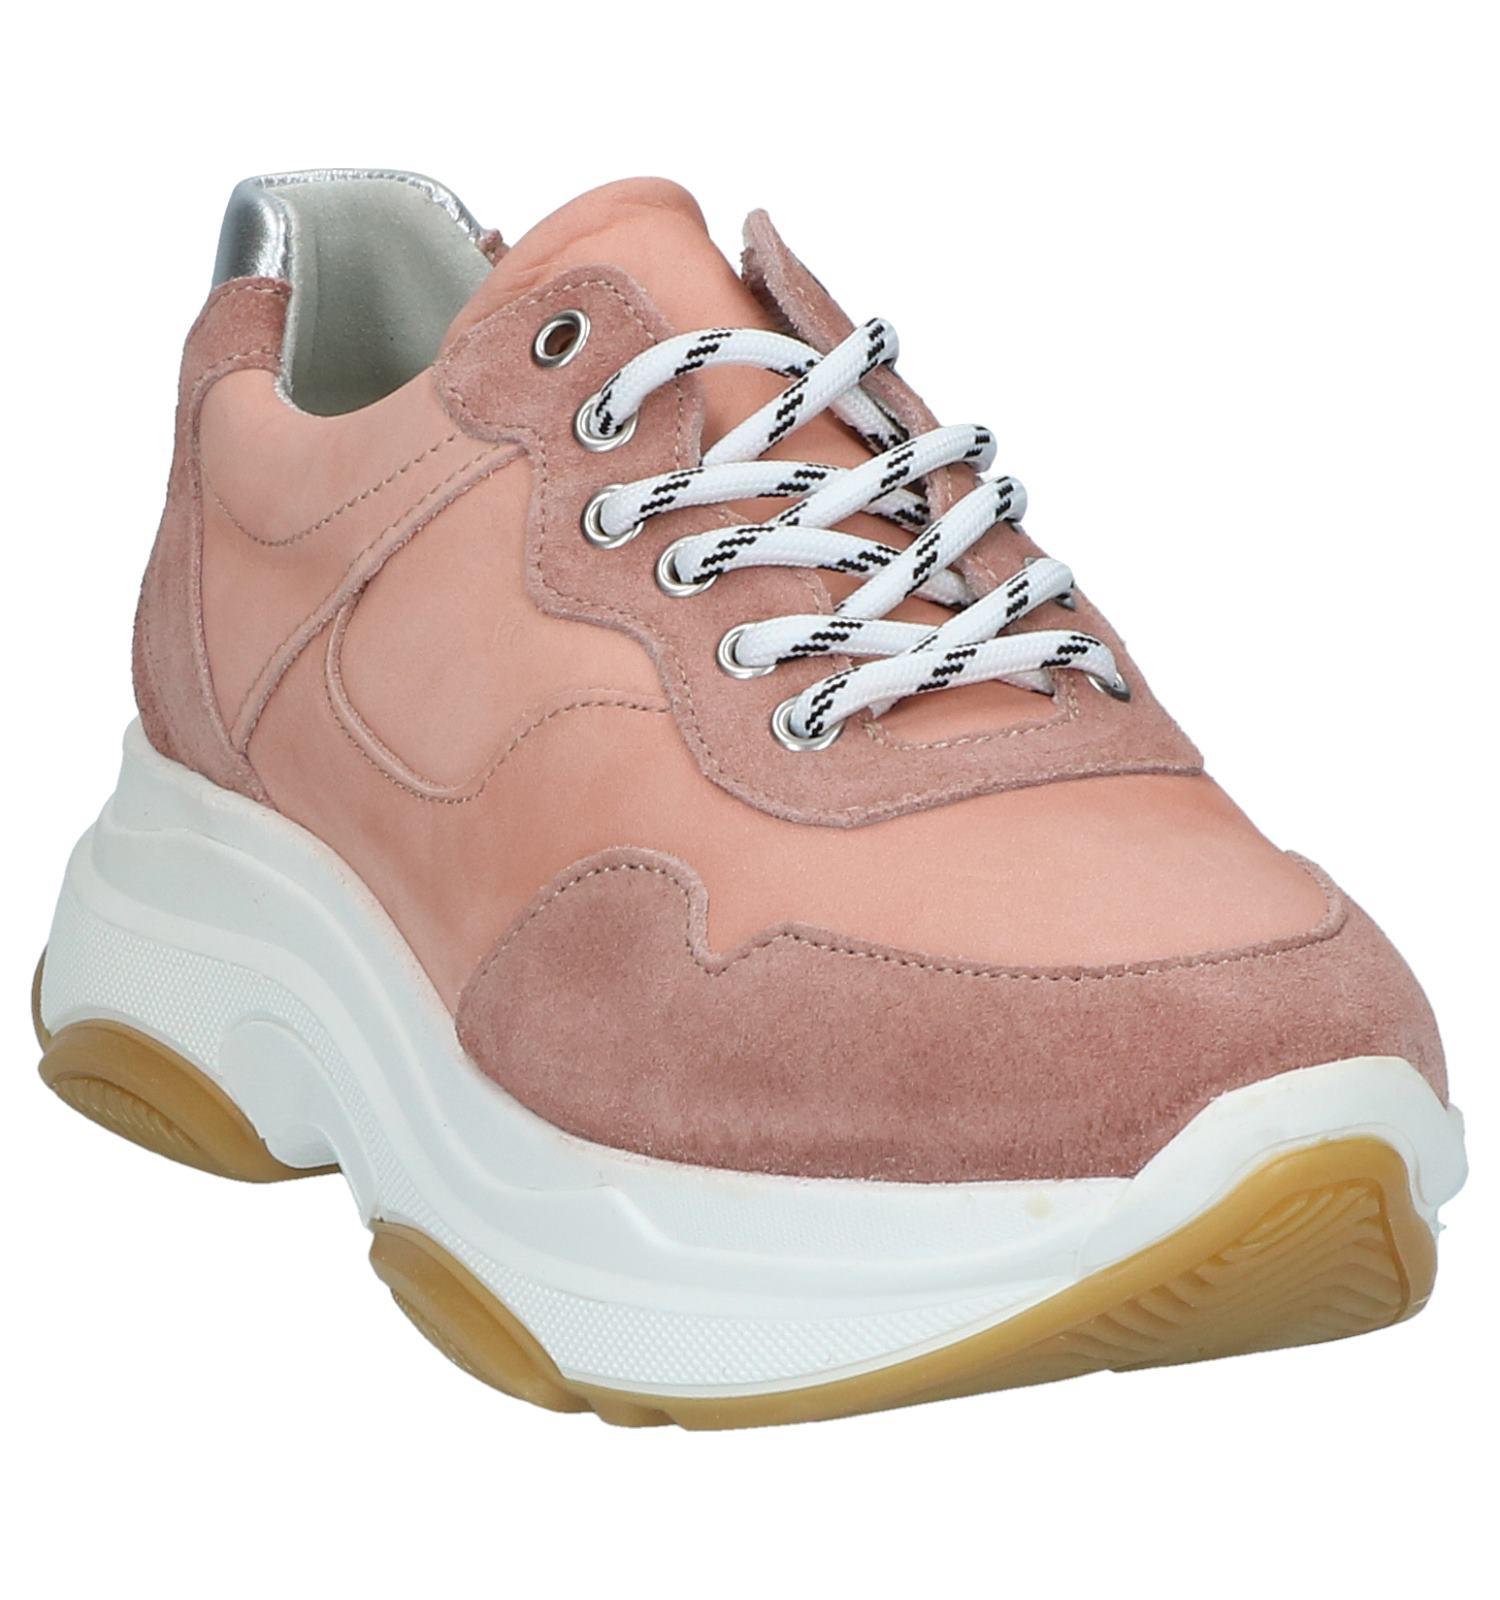 Bullboxer Sneakers Sneakers Bullboxer Pastel Roze Roze Roze Bullboxer Pastel Pastel Sneakers Bullboxer bmf7vI6Ygy